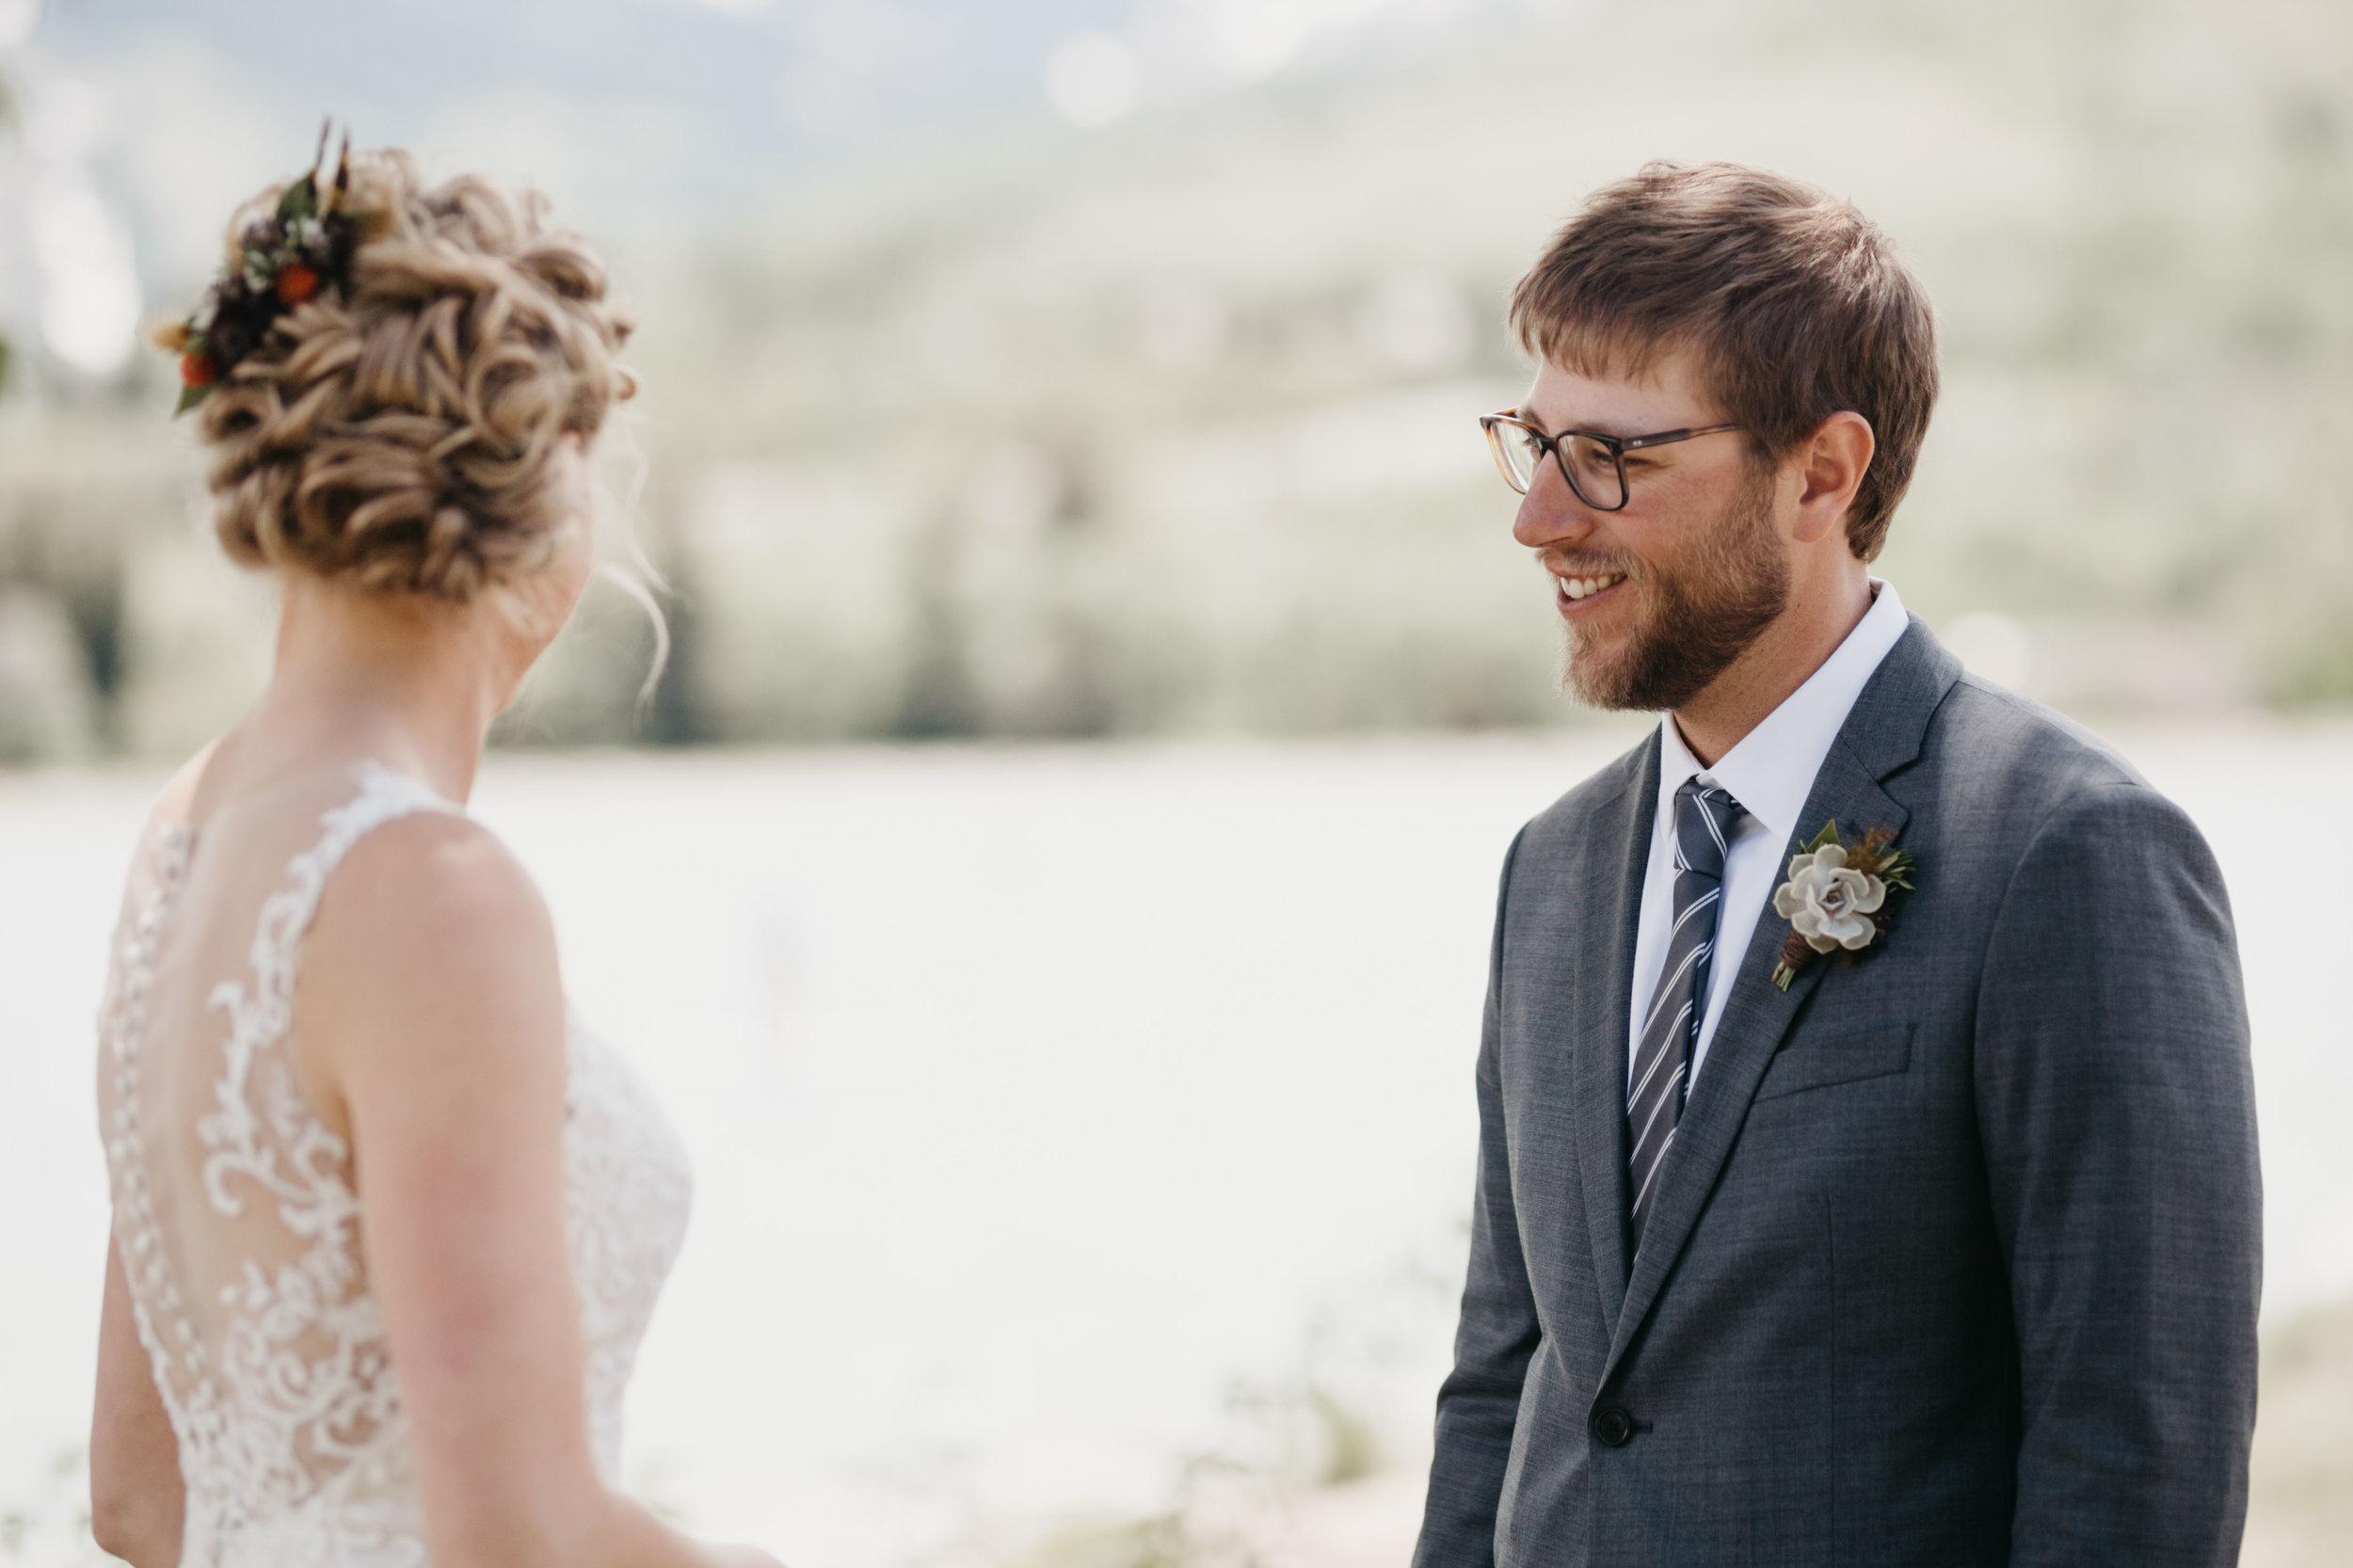 Colorado-Wedding-Photographer-20.jpg